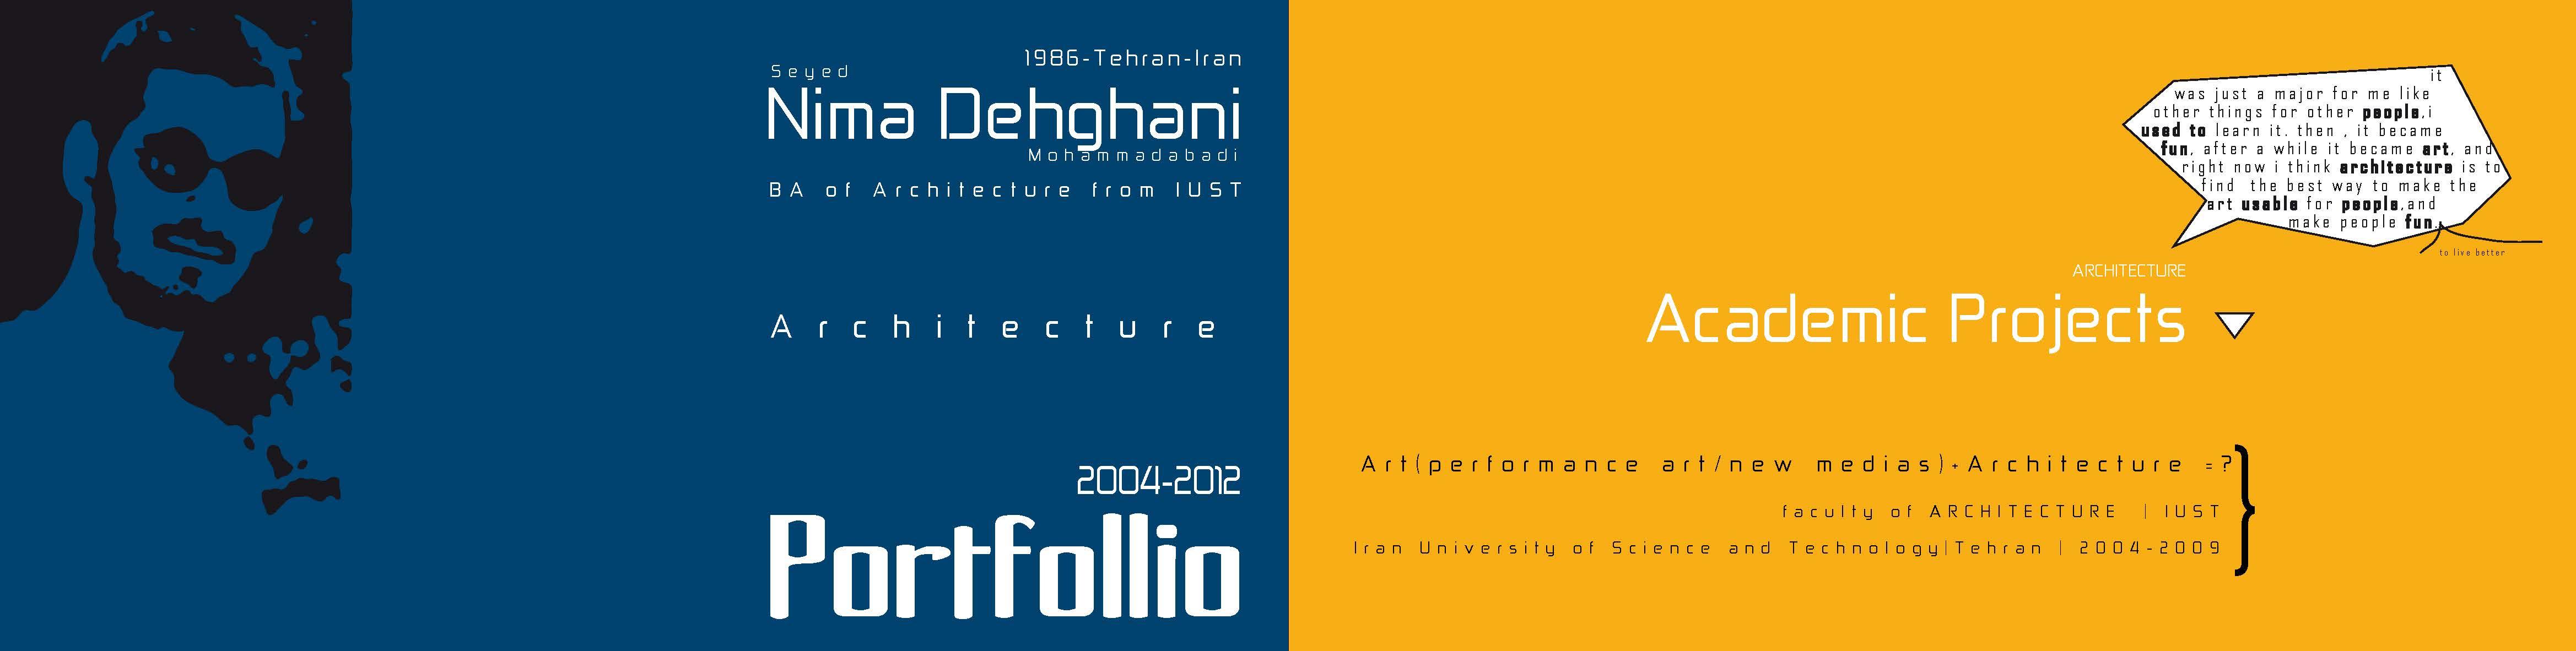 03-Portfolio-B-Architecture_Page_01